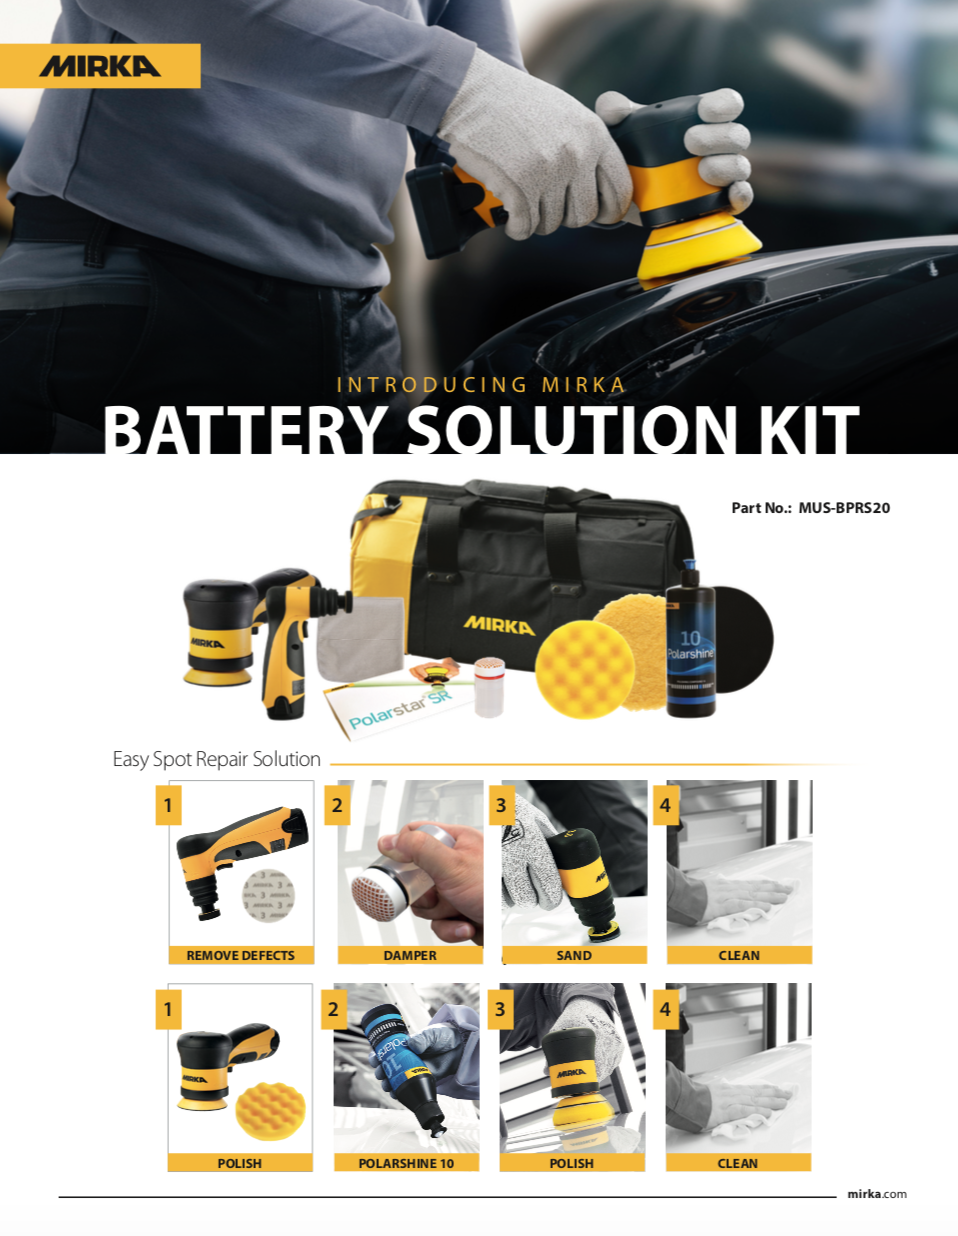 Mirka Battery Solution Kit